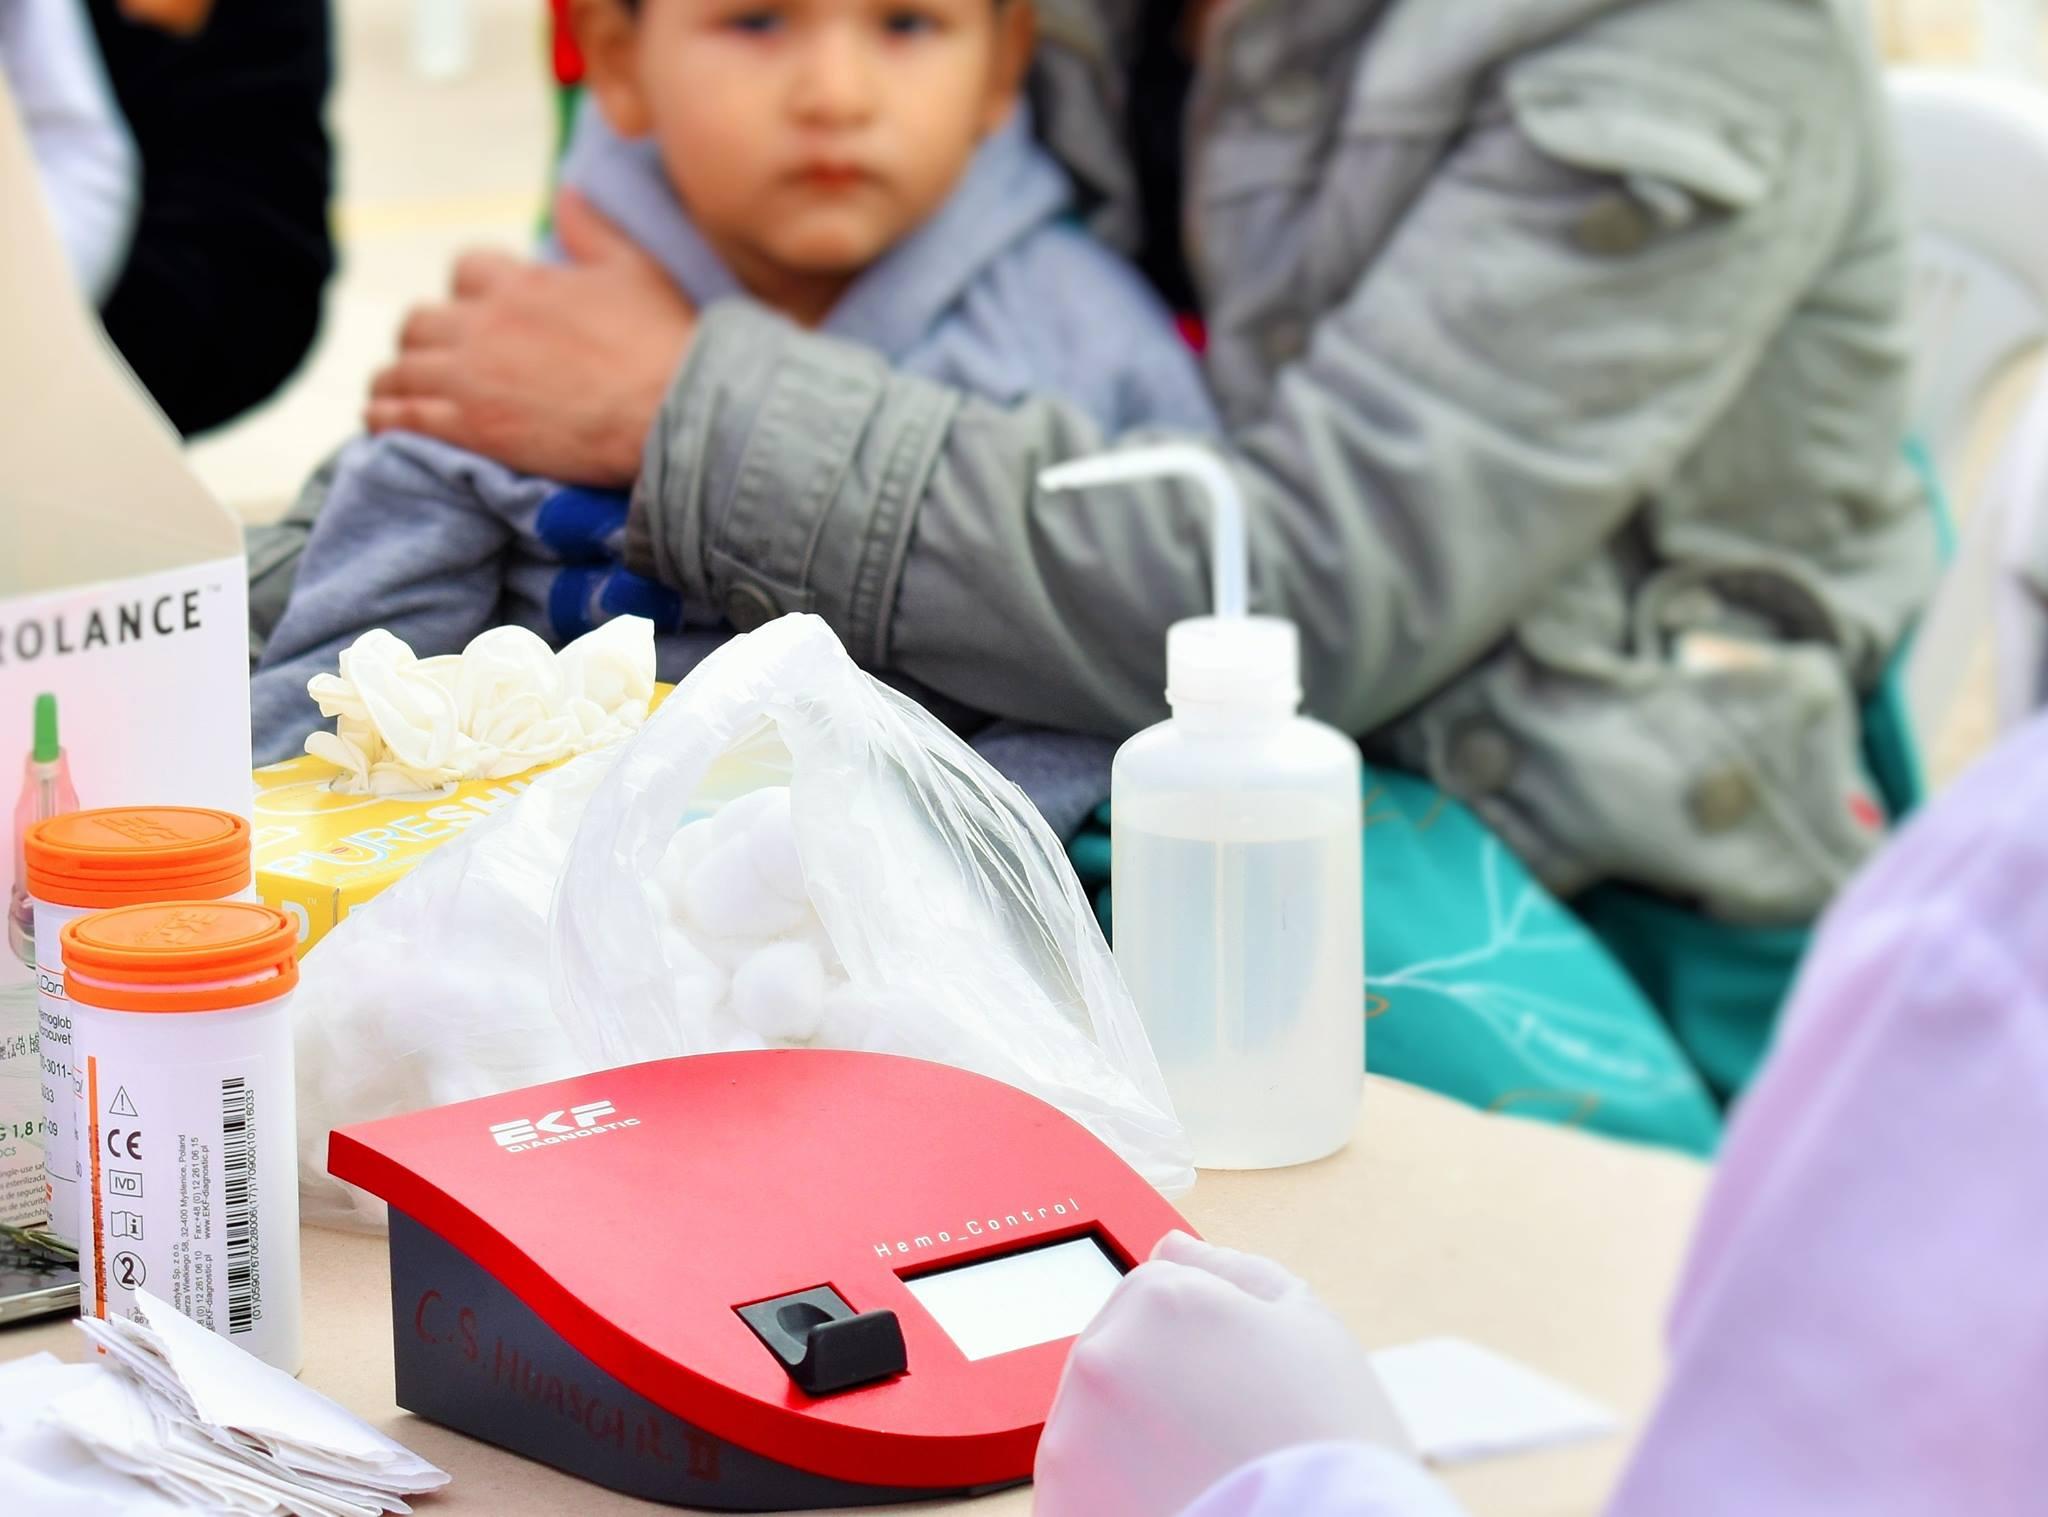 Hemo Control Hämoglobinmessgerät